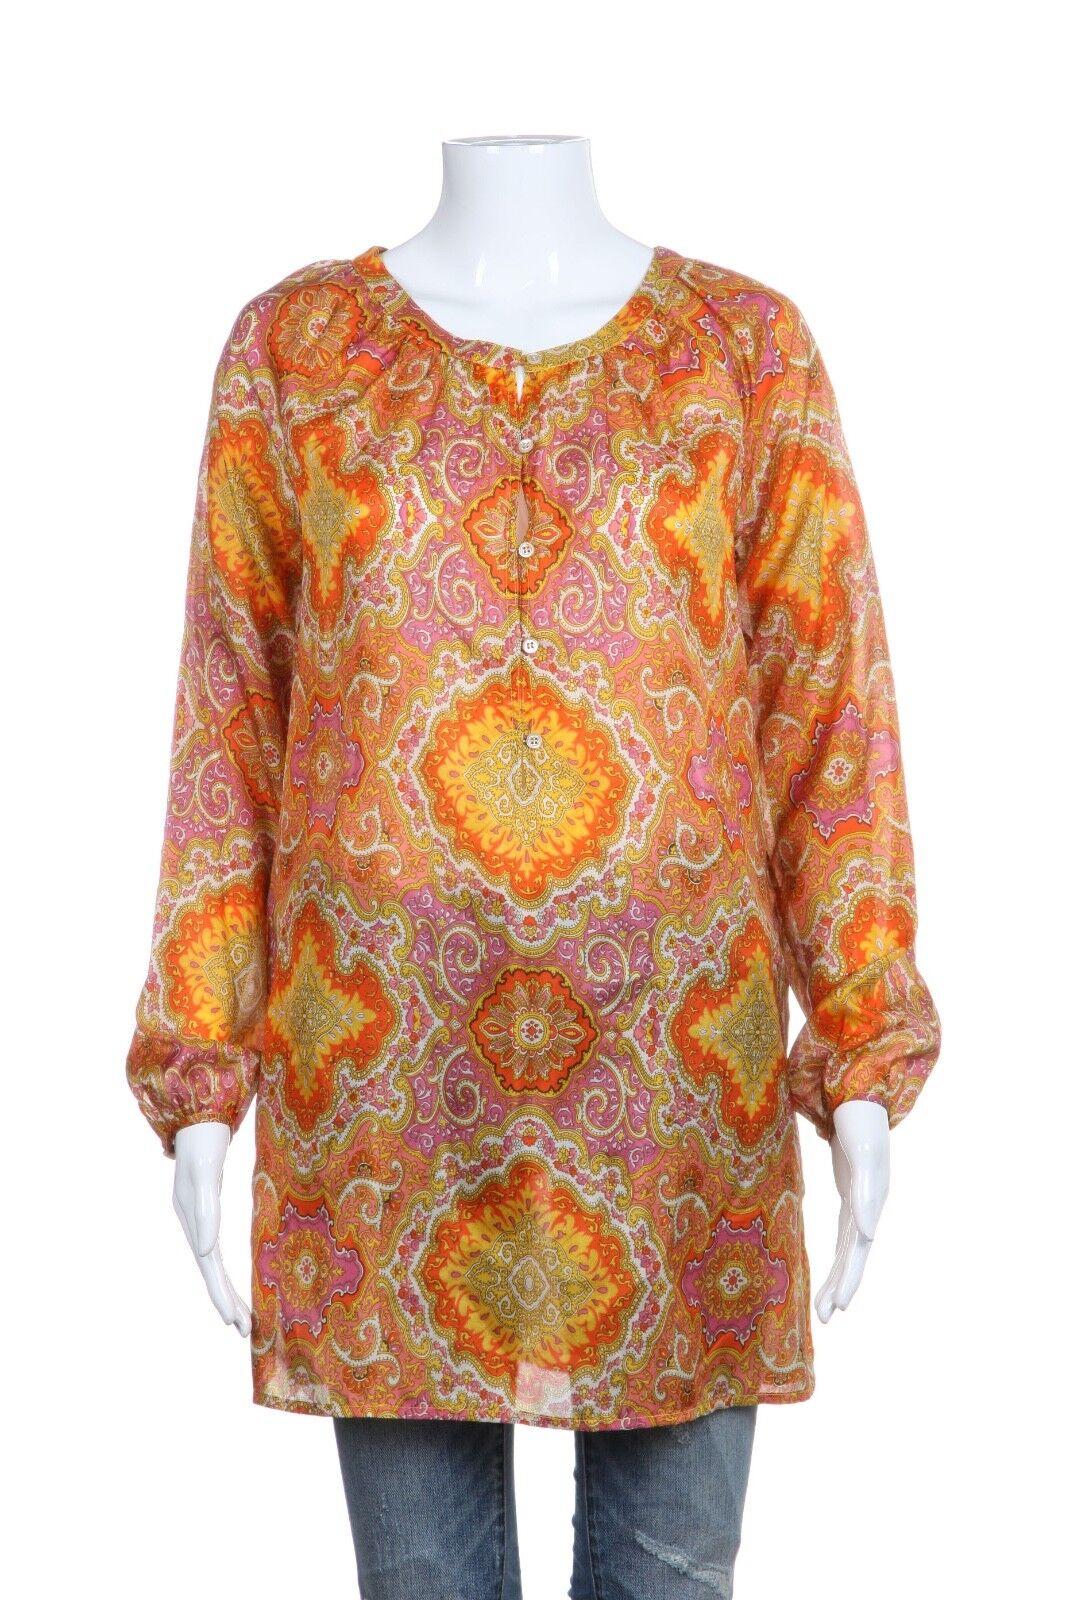 J.CREW Blouse XS 100% Silk Paisley Print Long Sleeve Top Yellow Pink orange